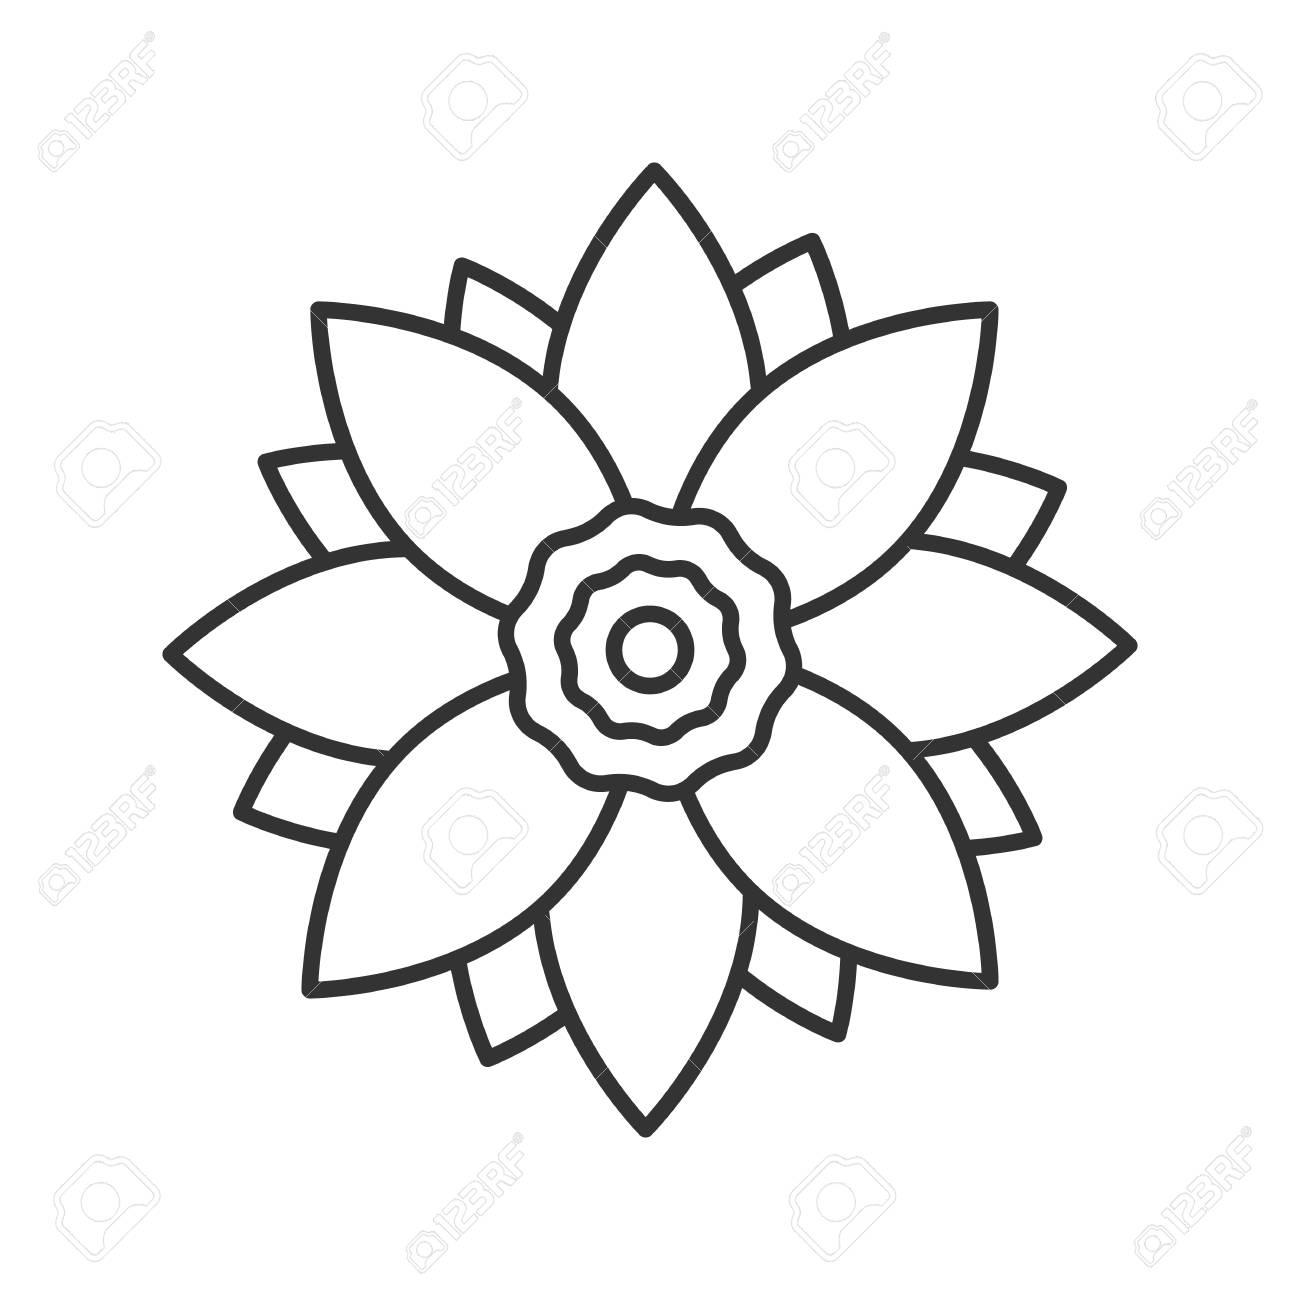 Lotus Line Drawing At Getdrawings Free For Personal Use Lotus